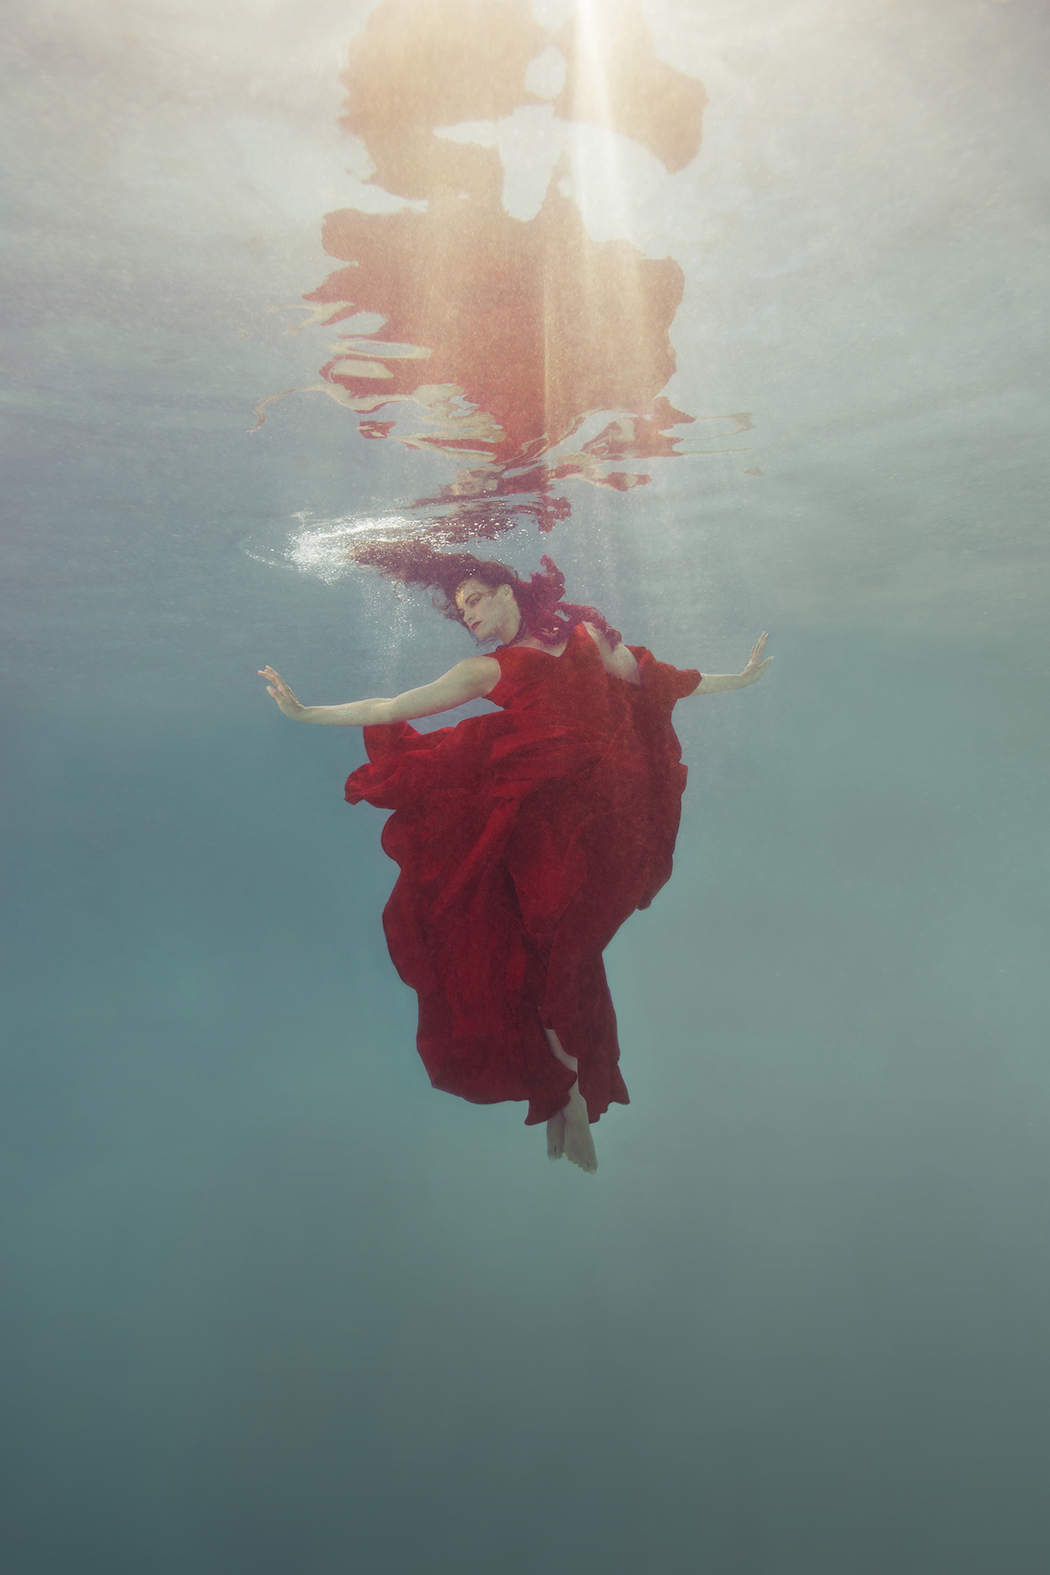 MalloryMorrison_photography-Phoenix-Reborn6-PhoenixRising